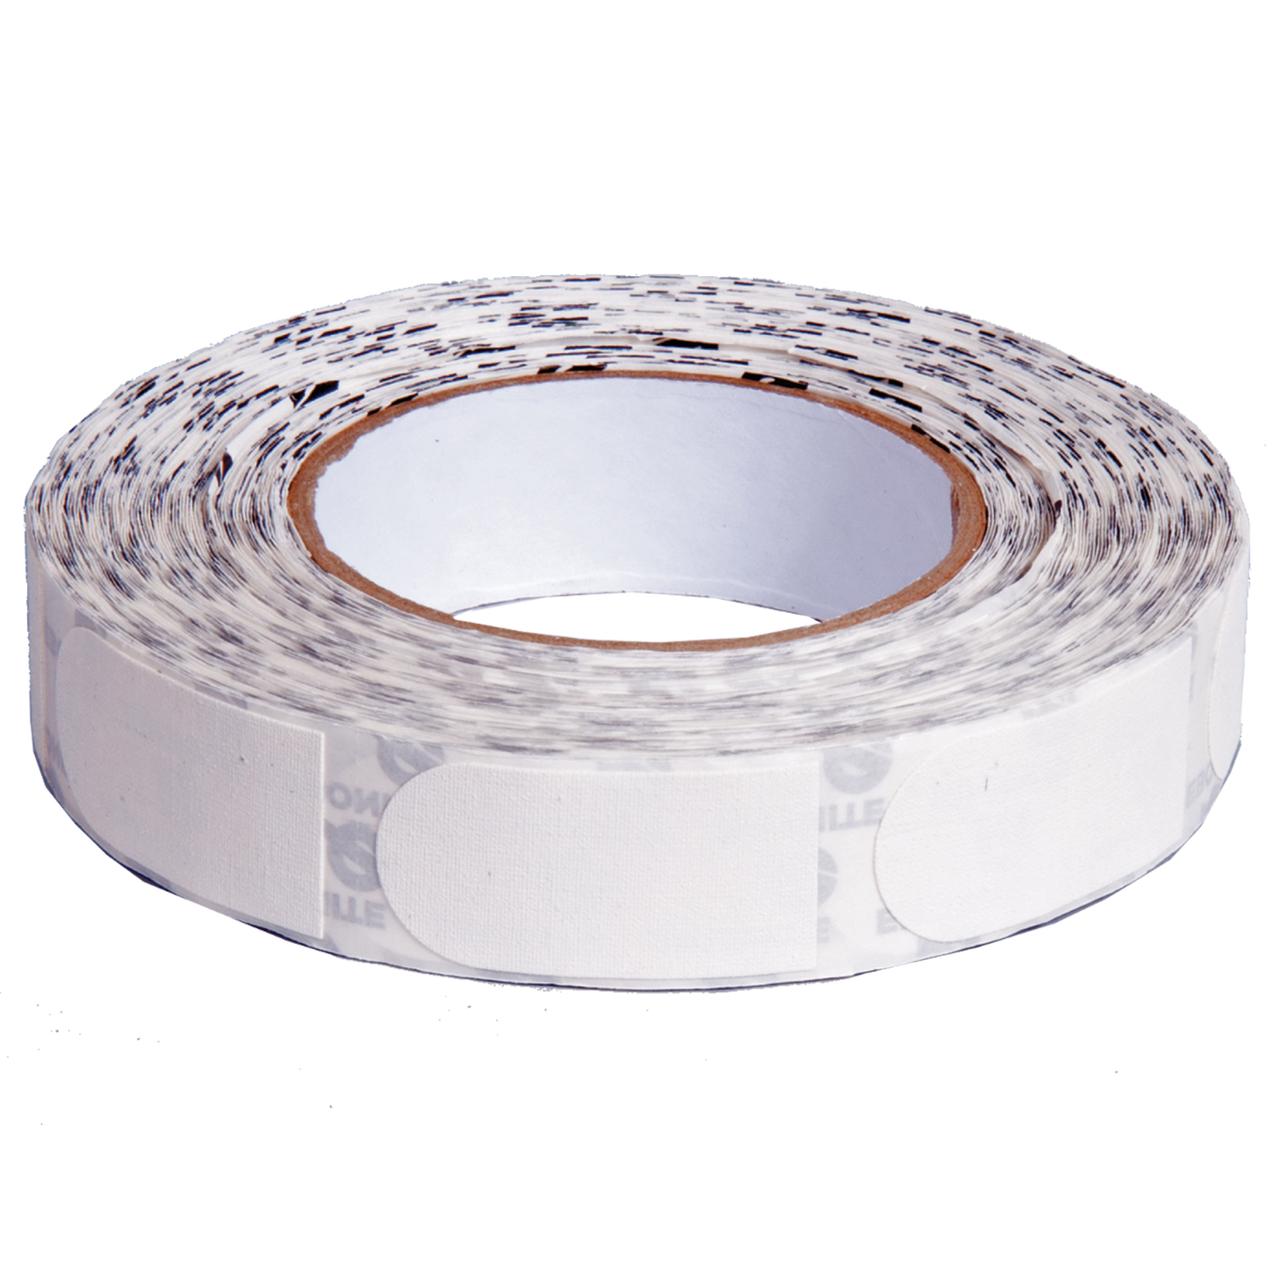 /pre Cut Powerhouse Power House Premium White Bowling Tape/ 30/Pi/èces/ /1